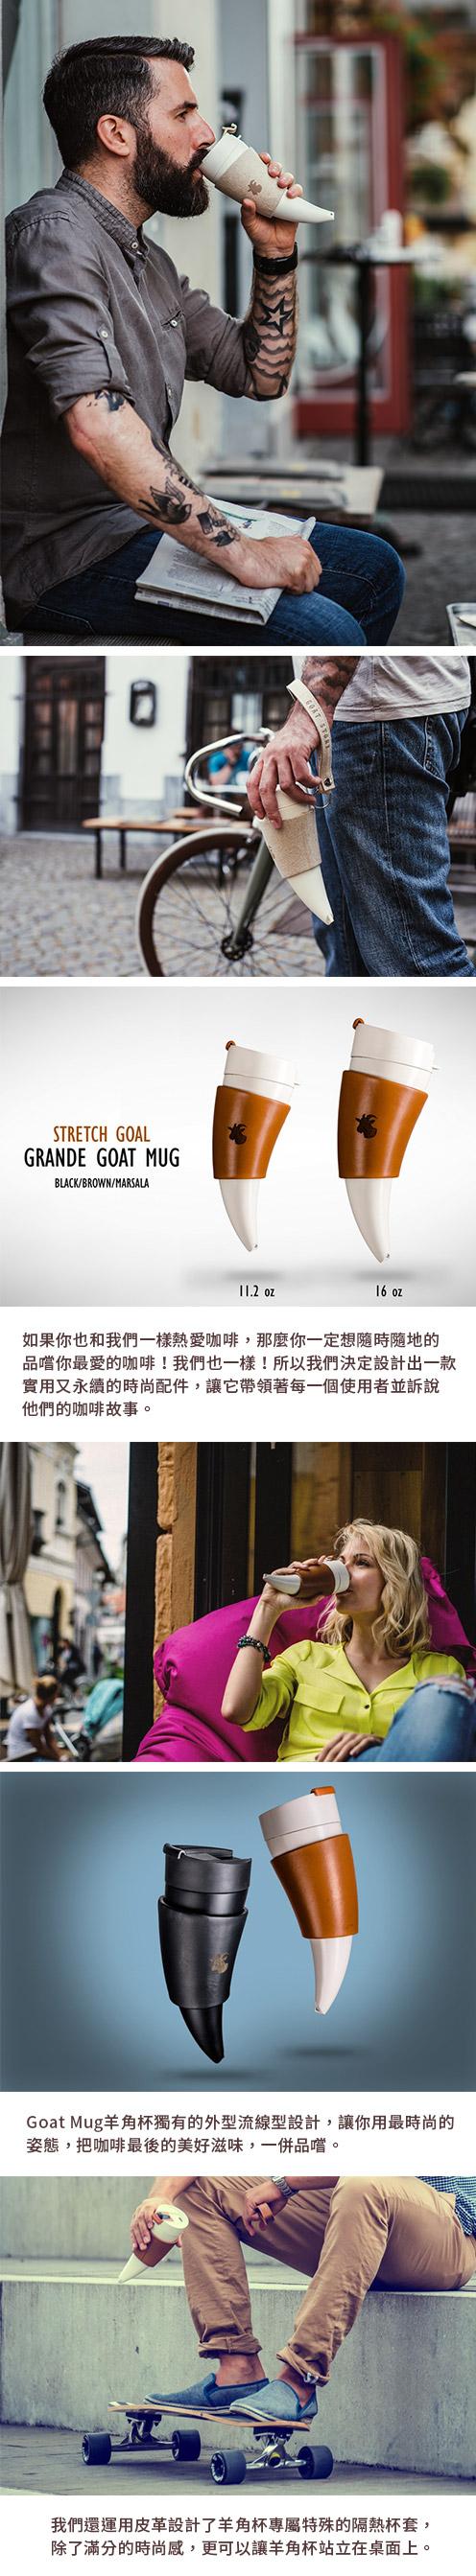 GOAT STORY Goat Mug 羊角杯 亞麻灰 (Original / 中杯12oz. / 麻)